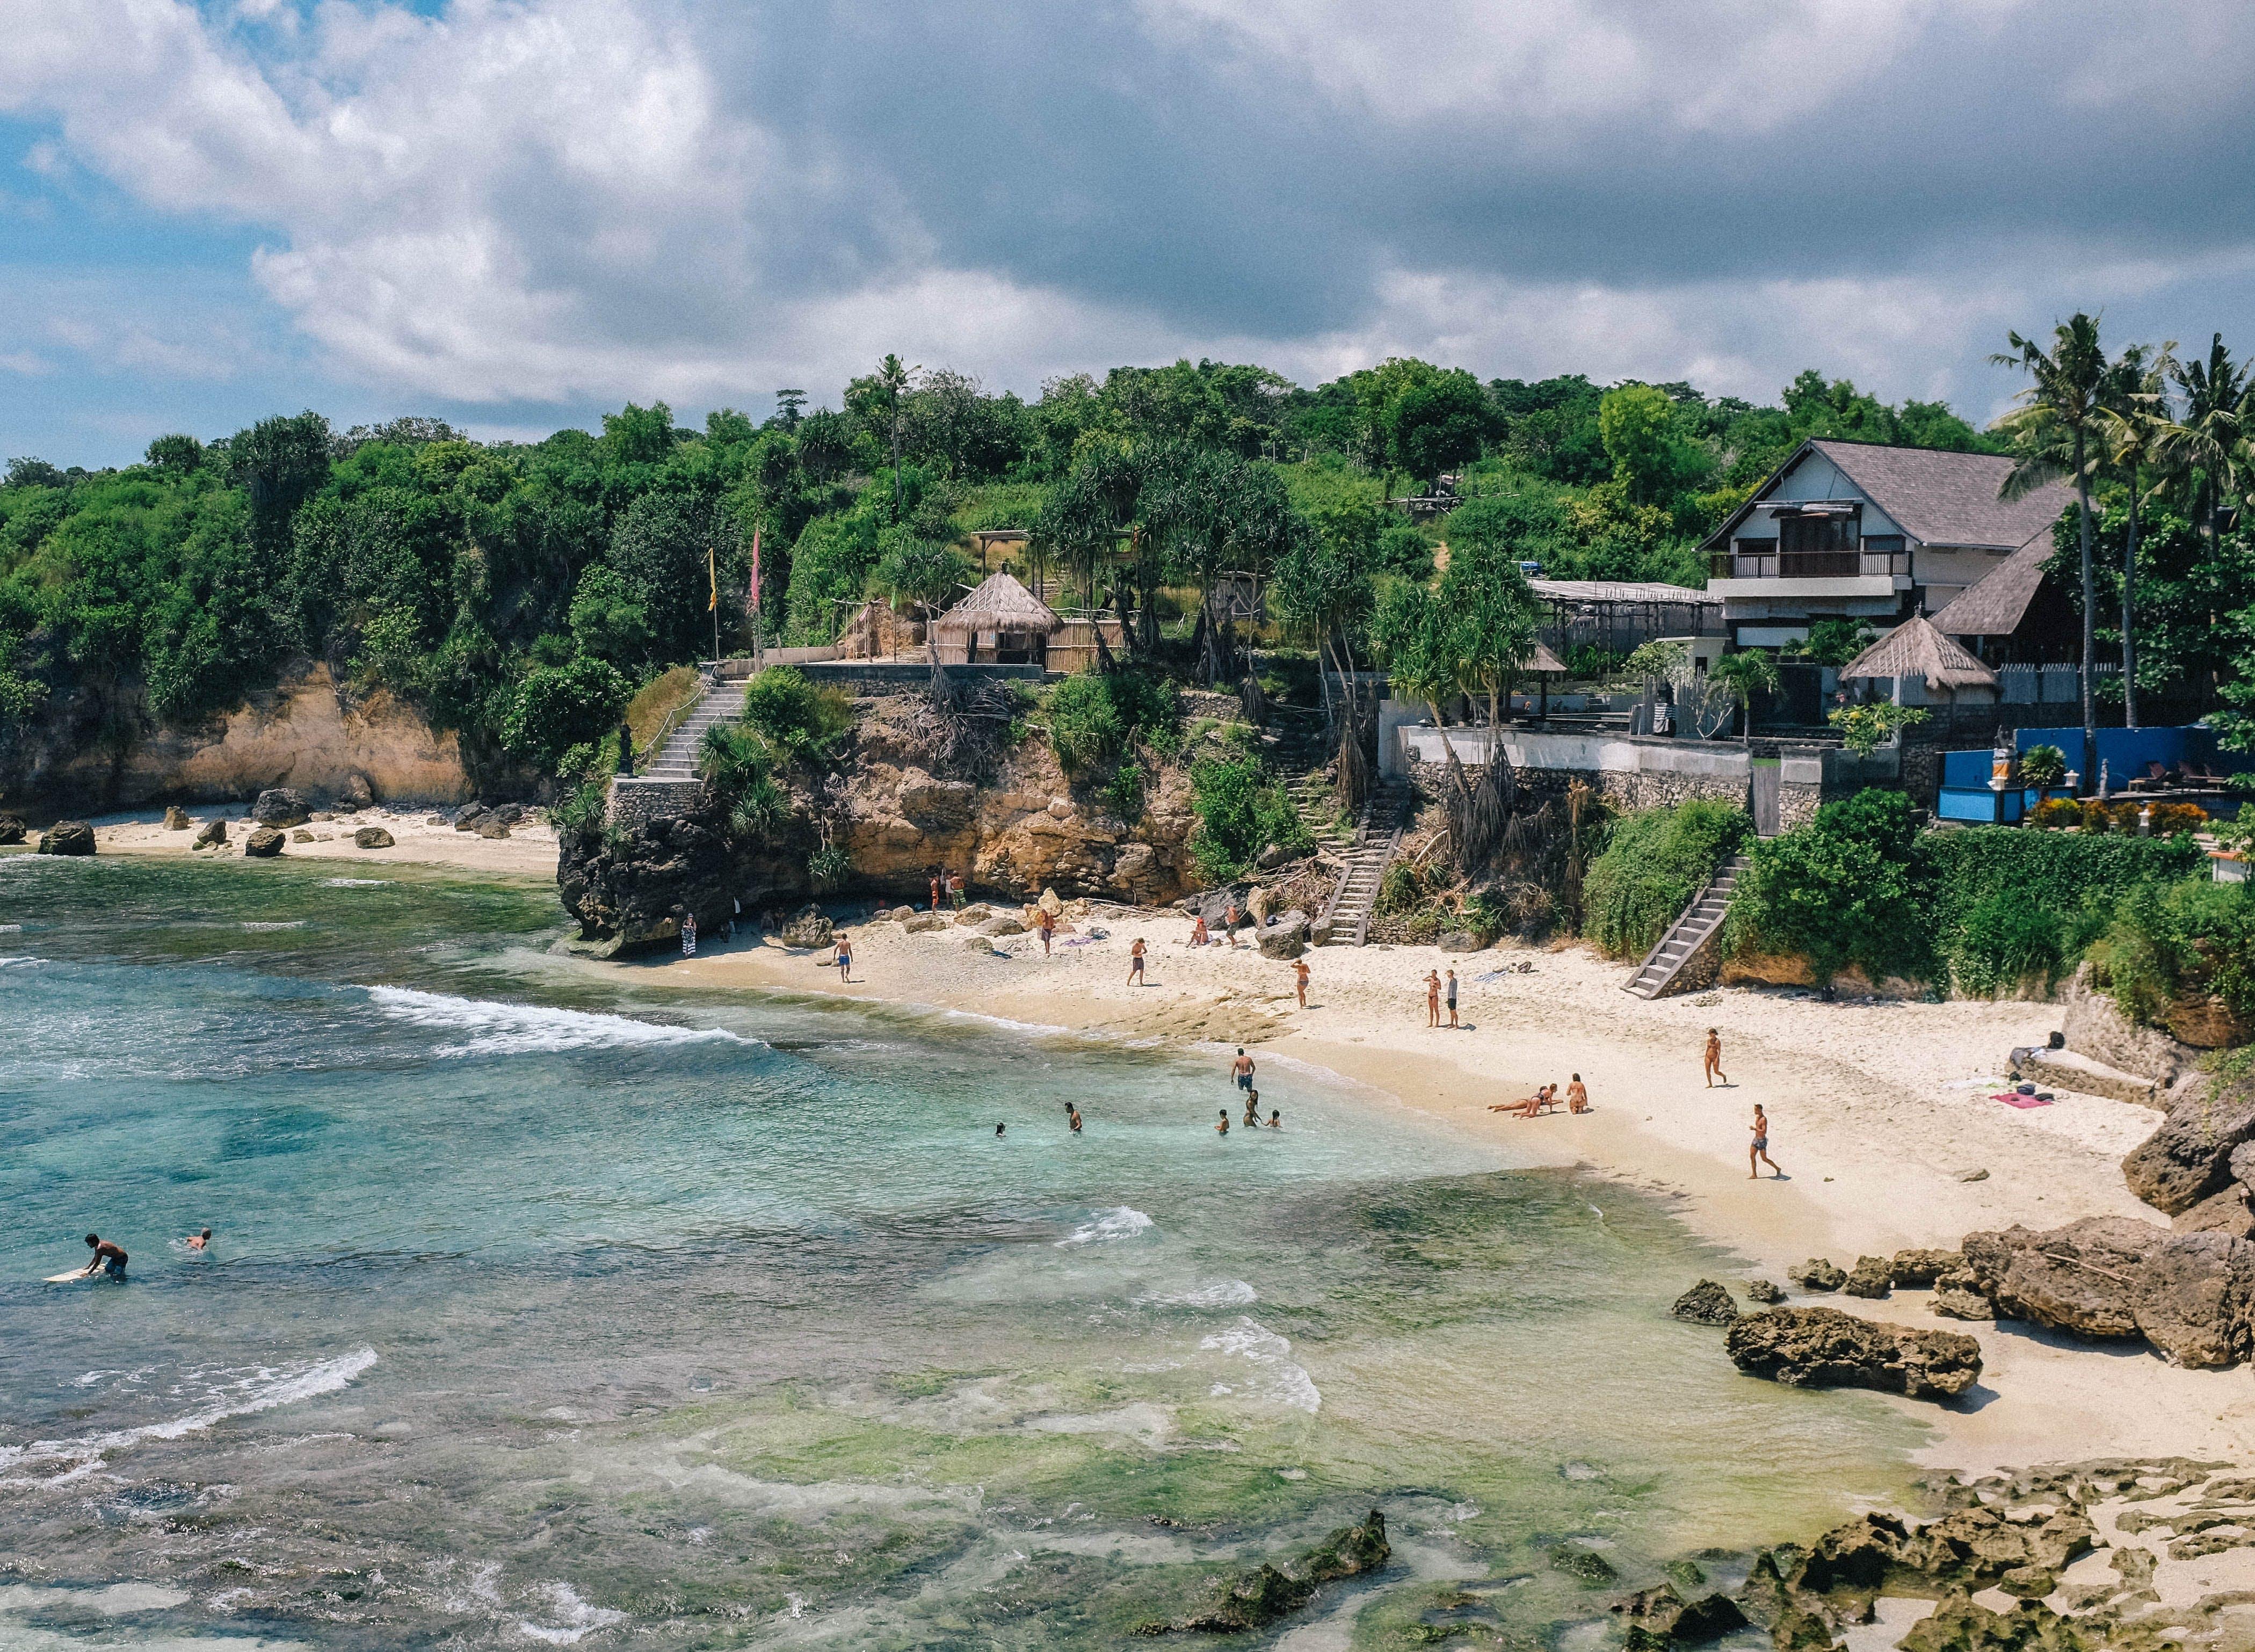 Fotos de stock gratuitas de azul, bali, costa, Indonesia